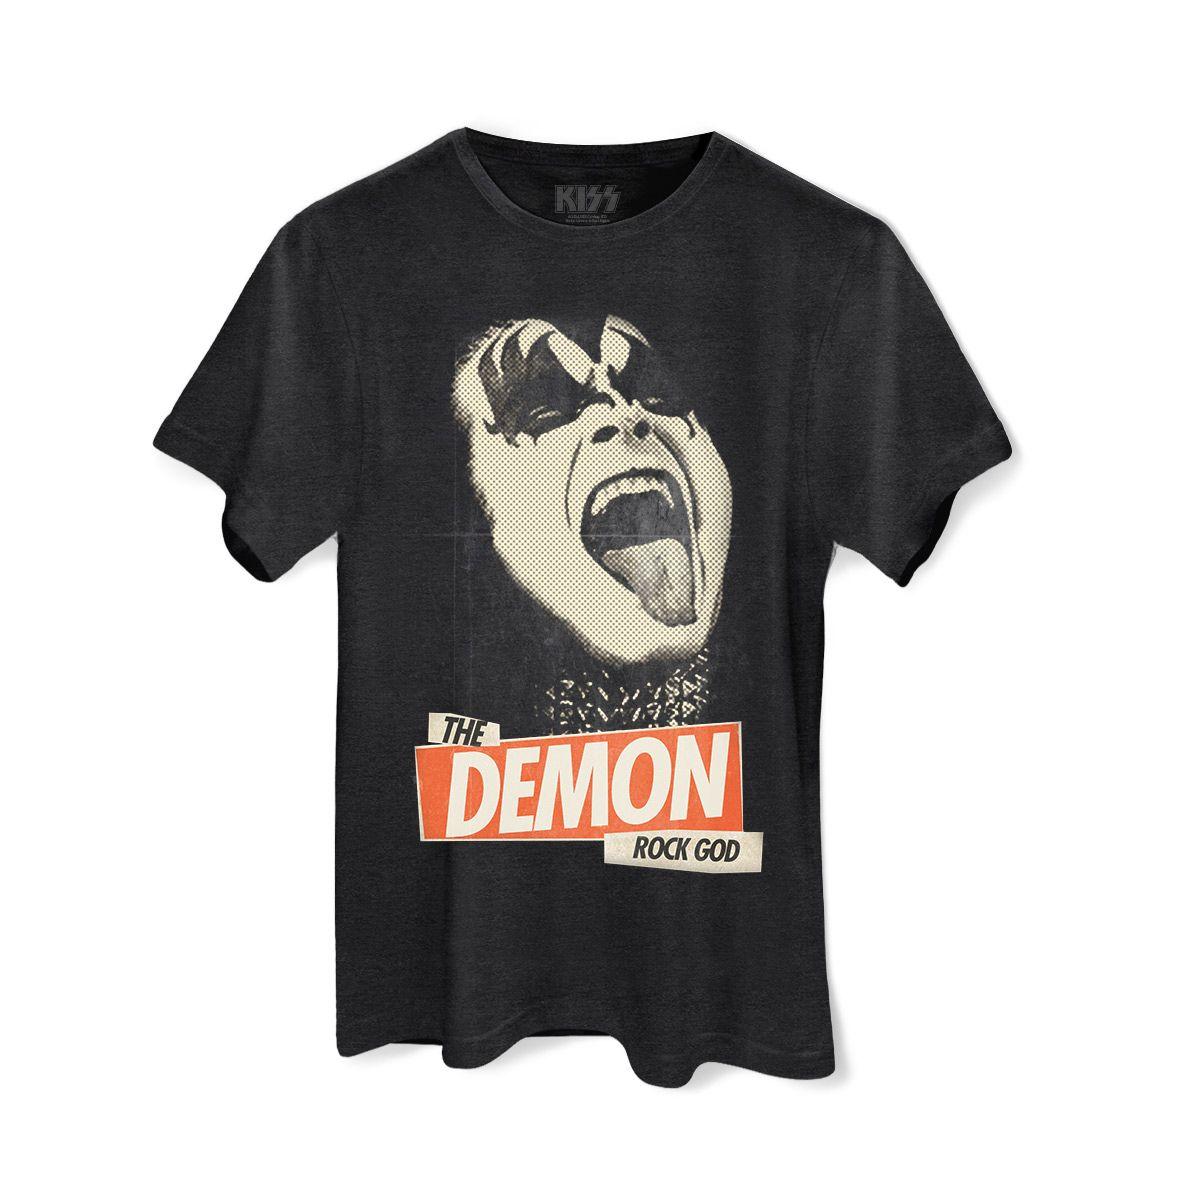 T-shirt Premium Masculina Kiss Rock God #Kiss #TheDemon #Rock #ShowdoKiss #CamisetadeRock